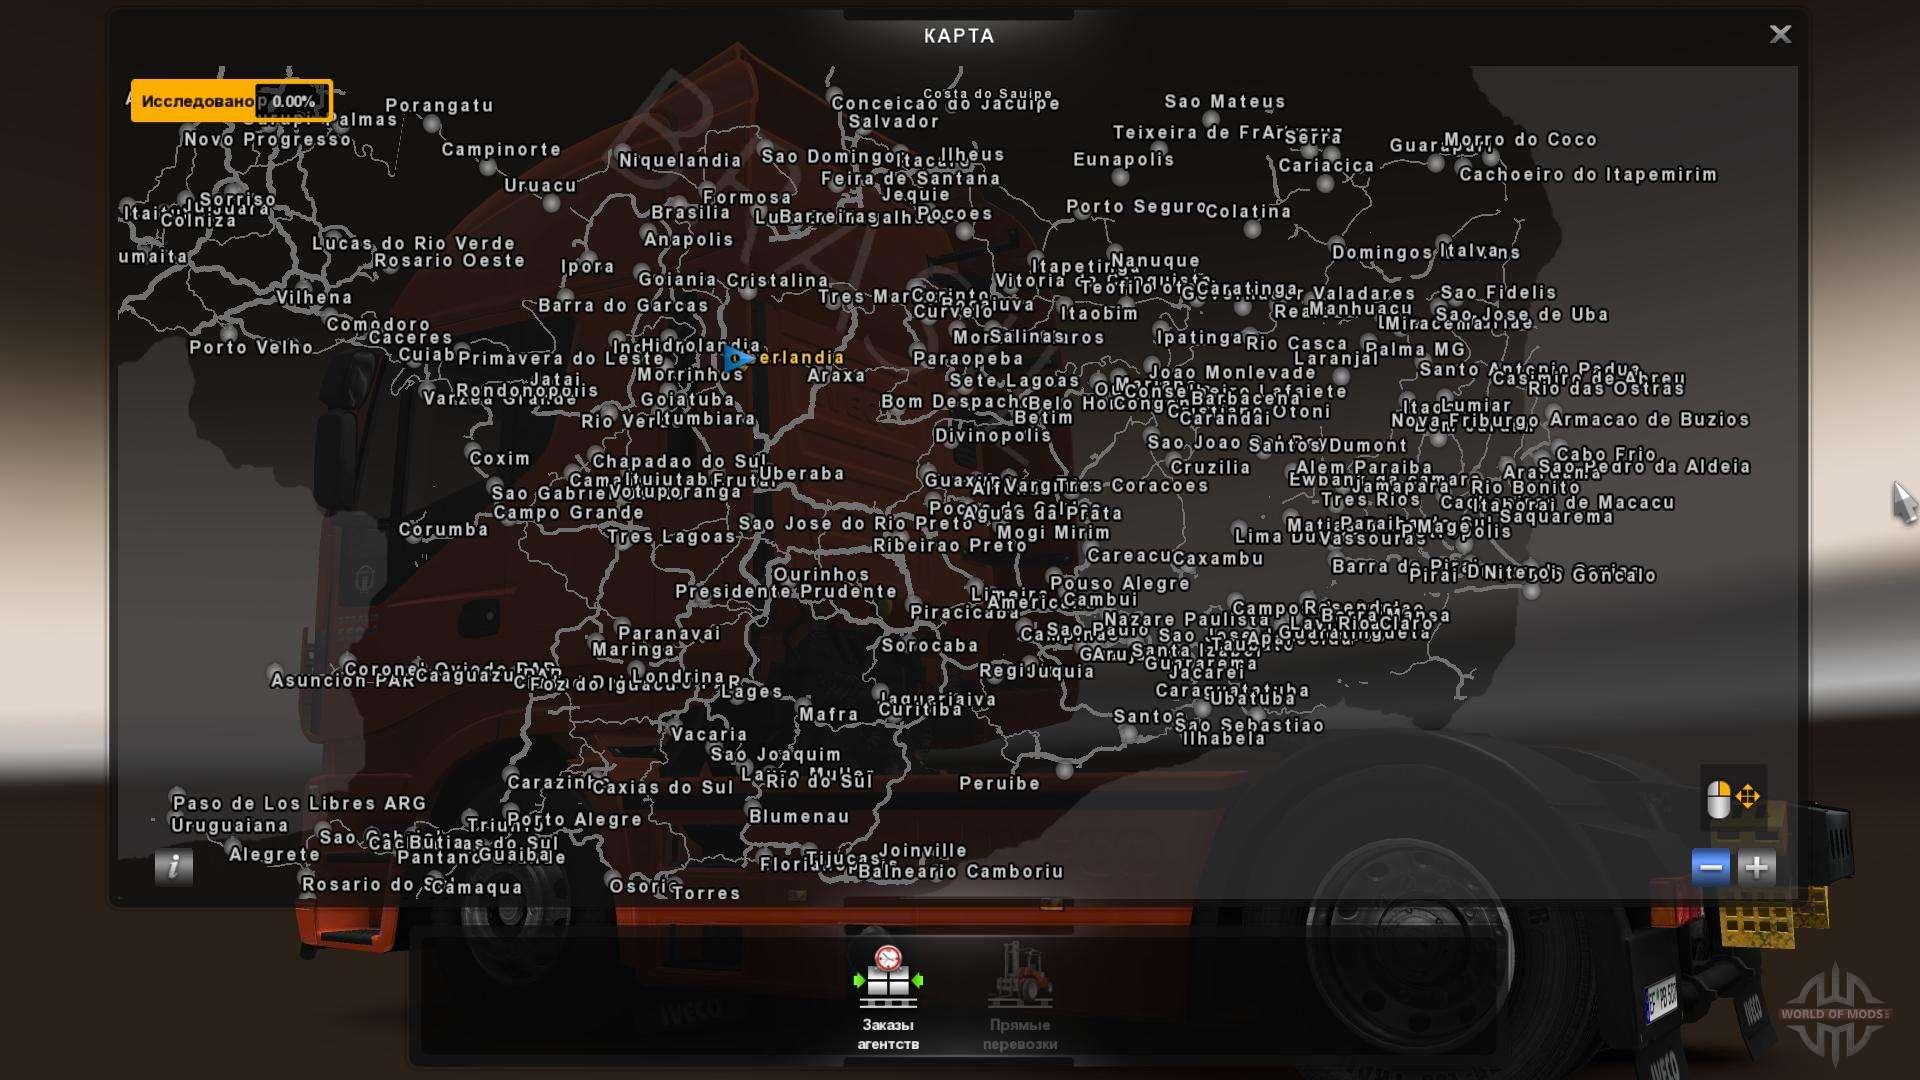 mapa euro truck simulator 2 Mapa Brasil Total 4.2 [TRUCK VERSION] for Euro Truck Simulator 2 mapa euro truck simulator 2